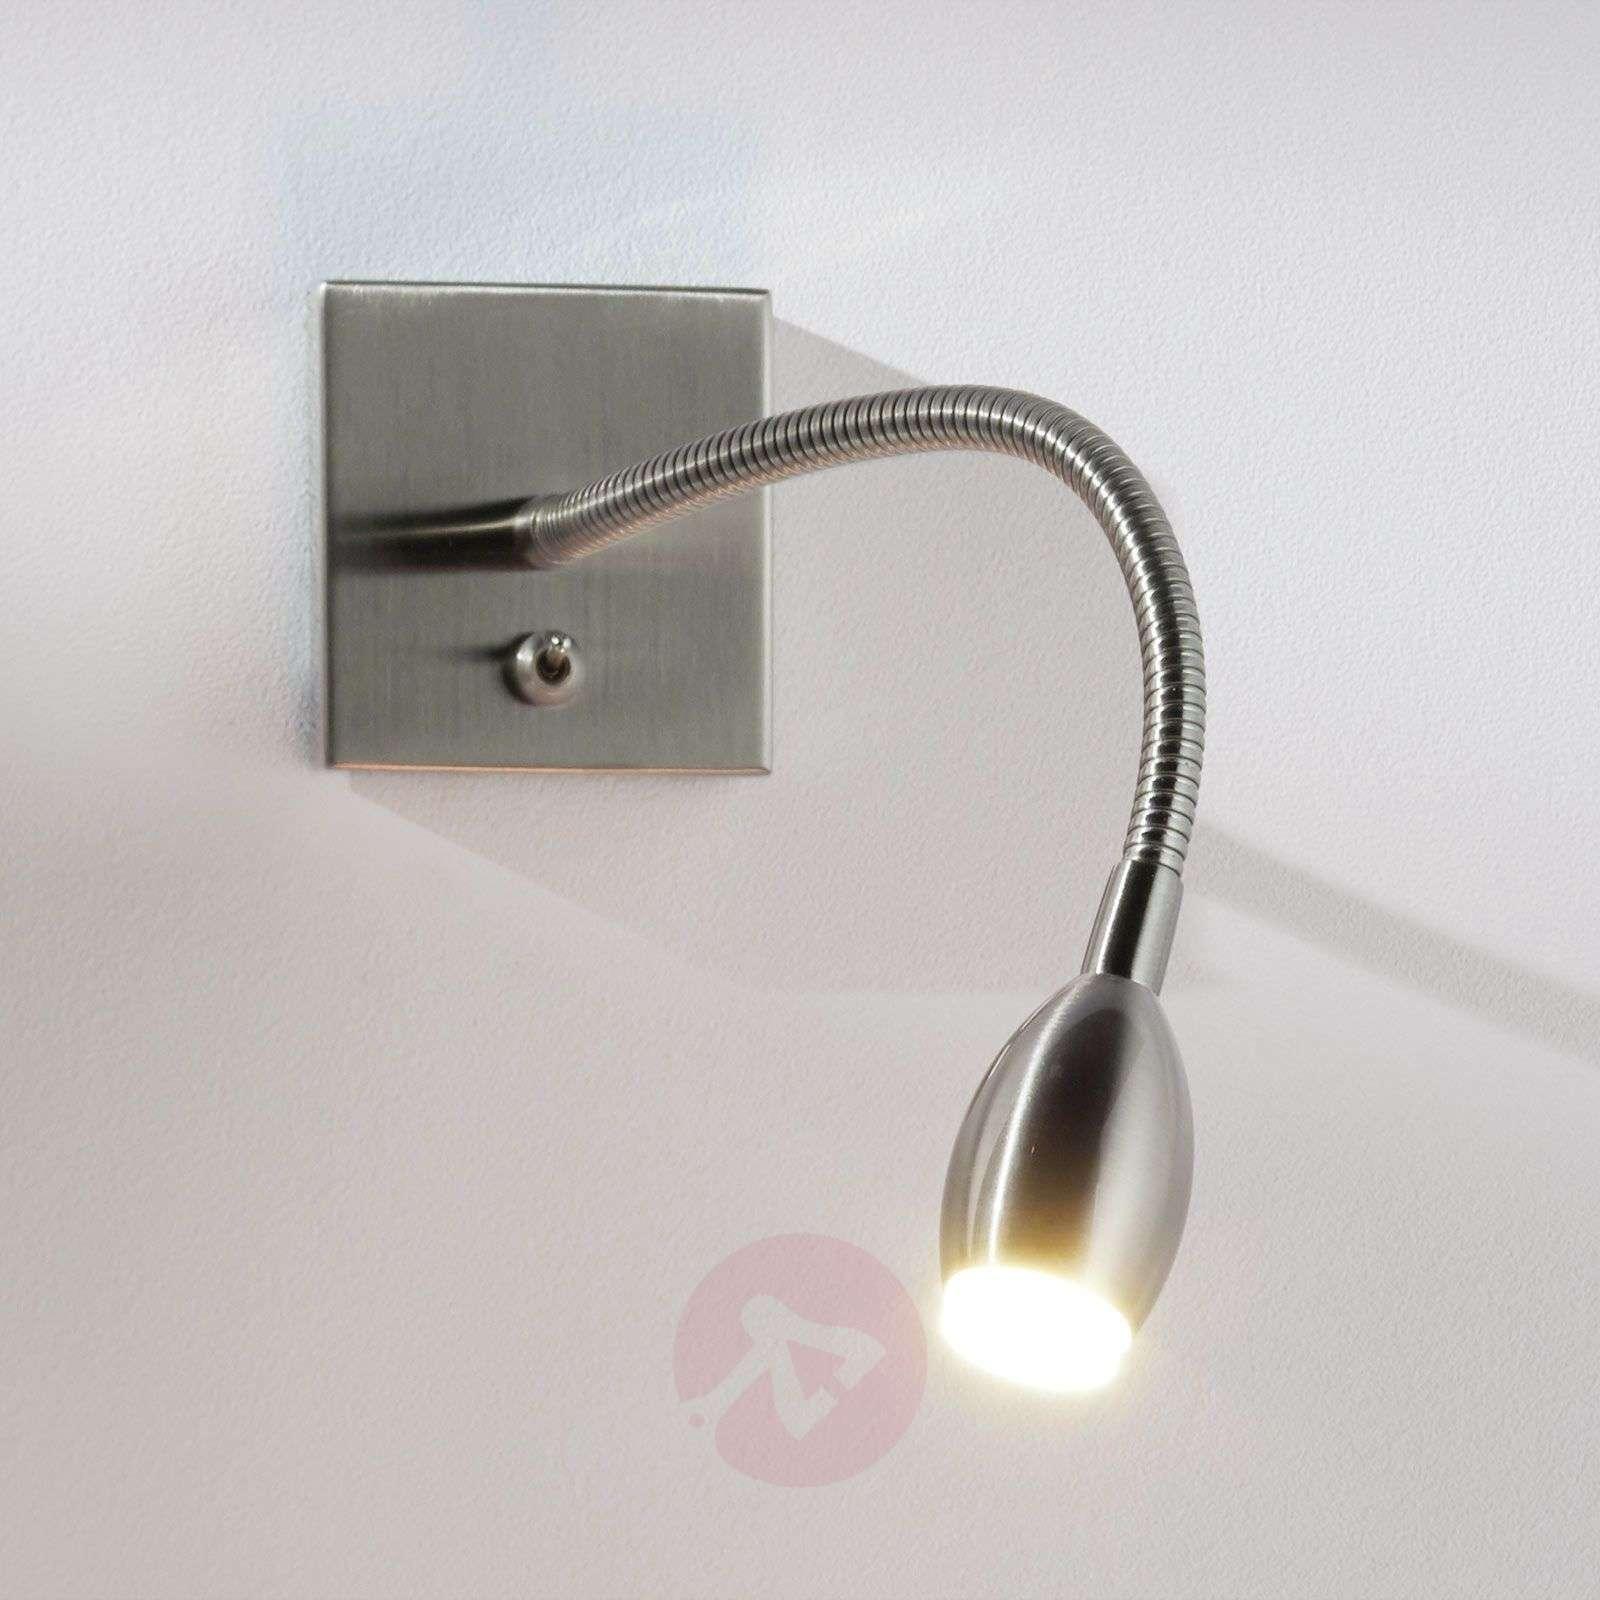 LED wall light PILAR with flex arm, nickel-1050007-02